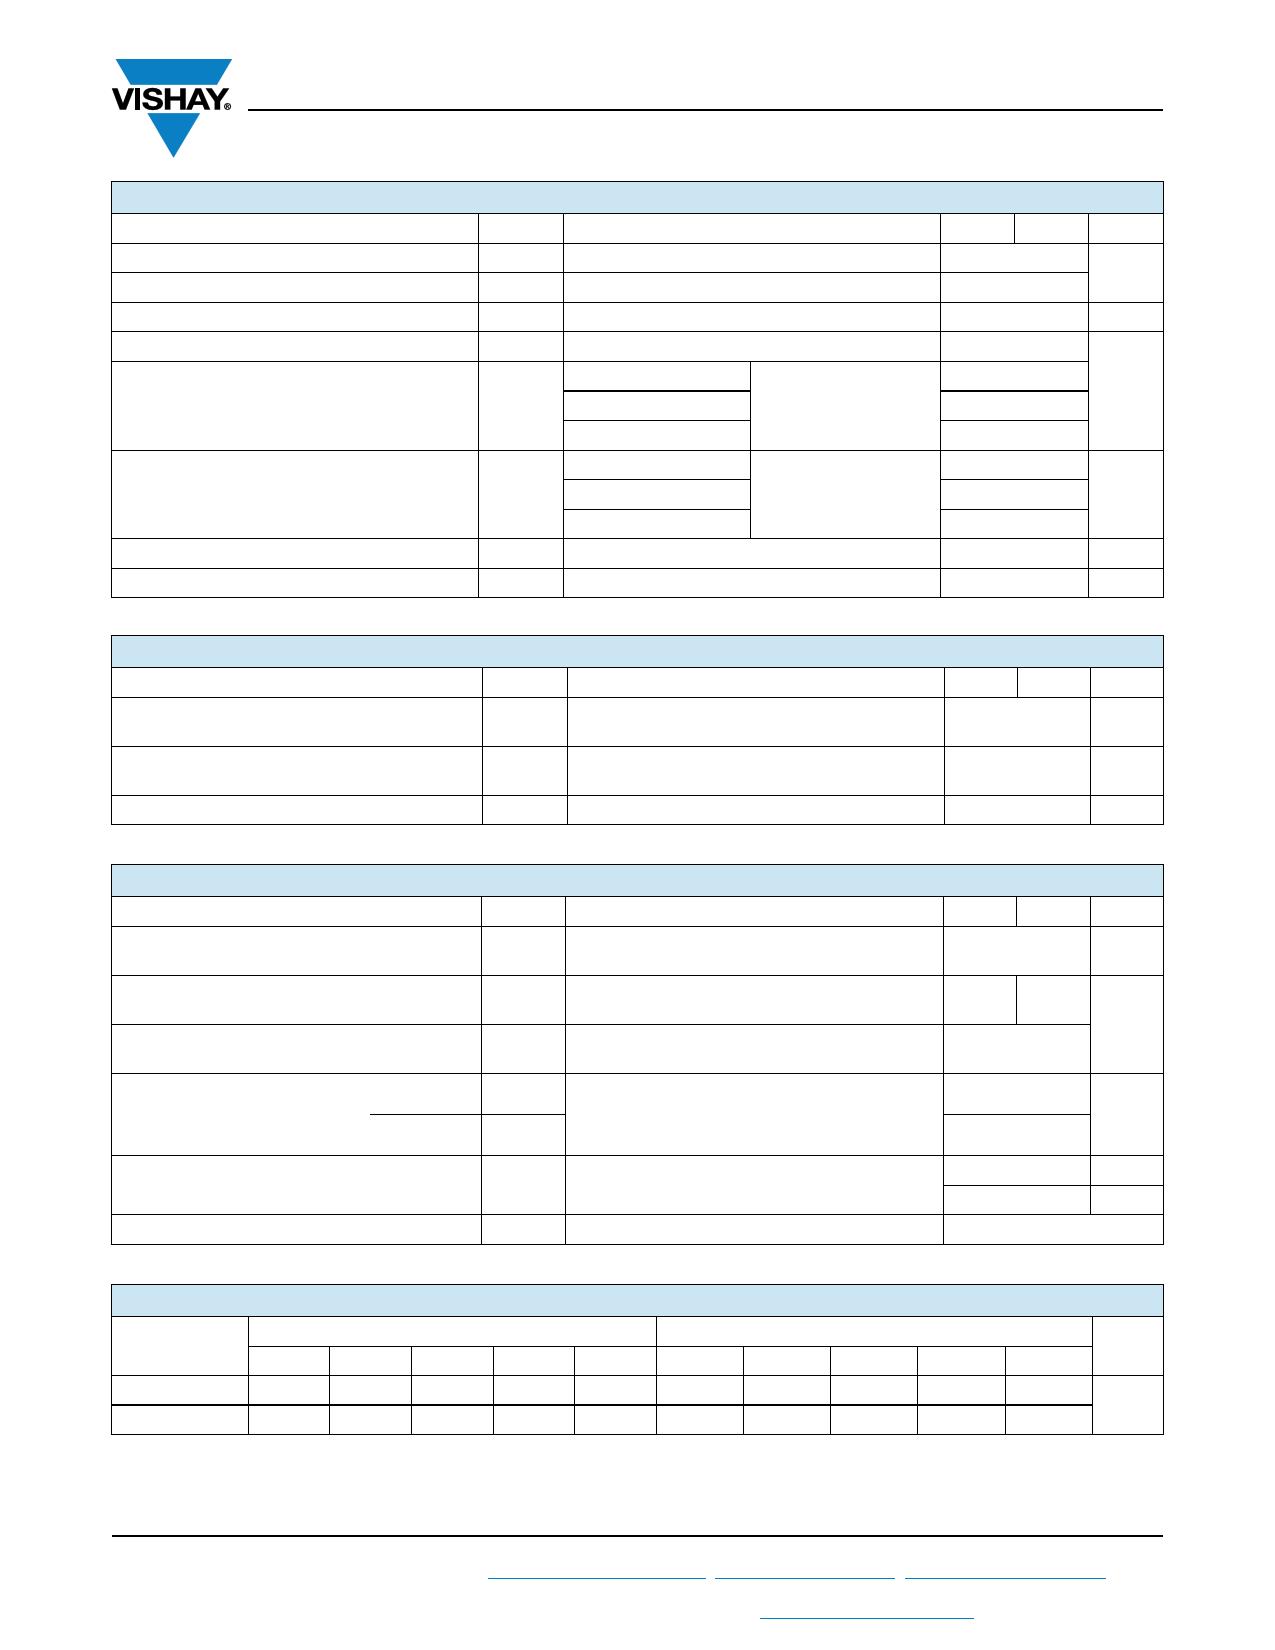 VSKT57-14S90P pdf, ピン配列